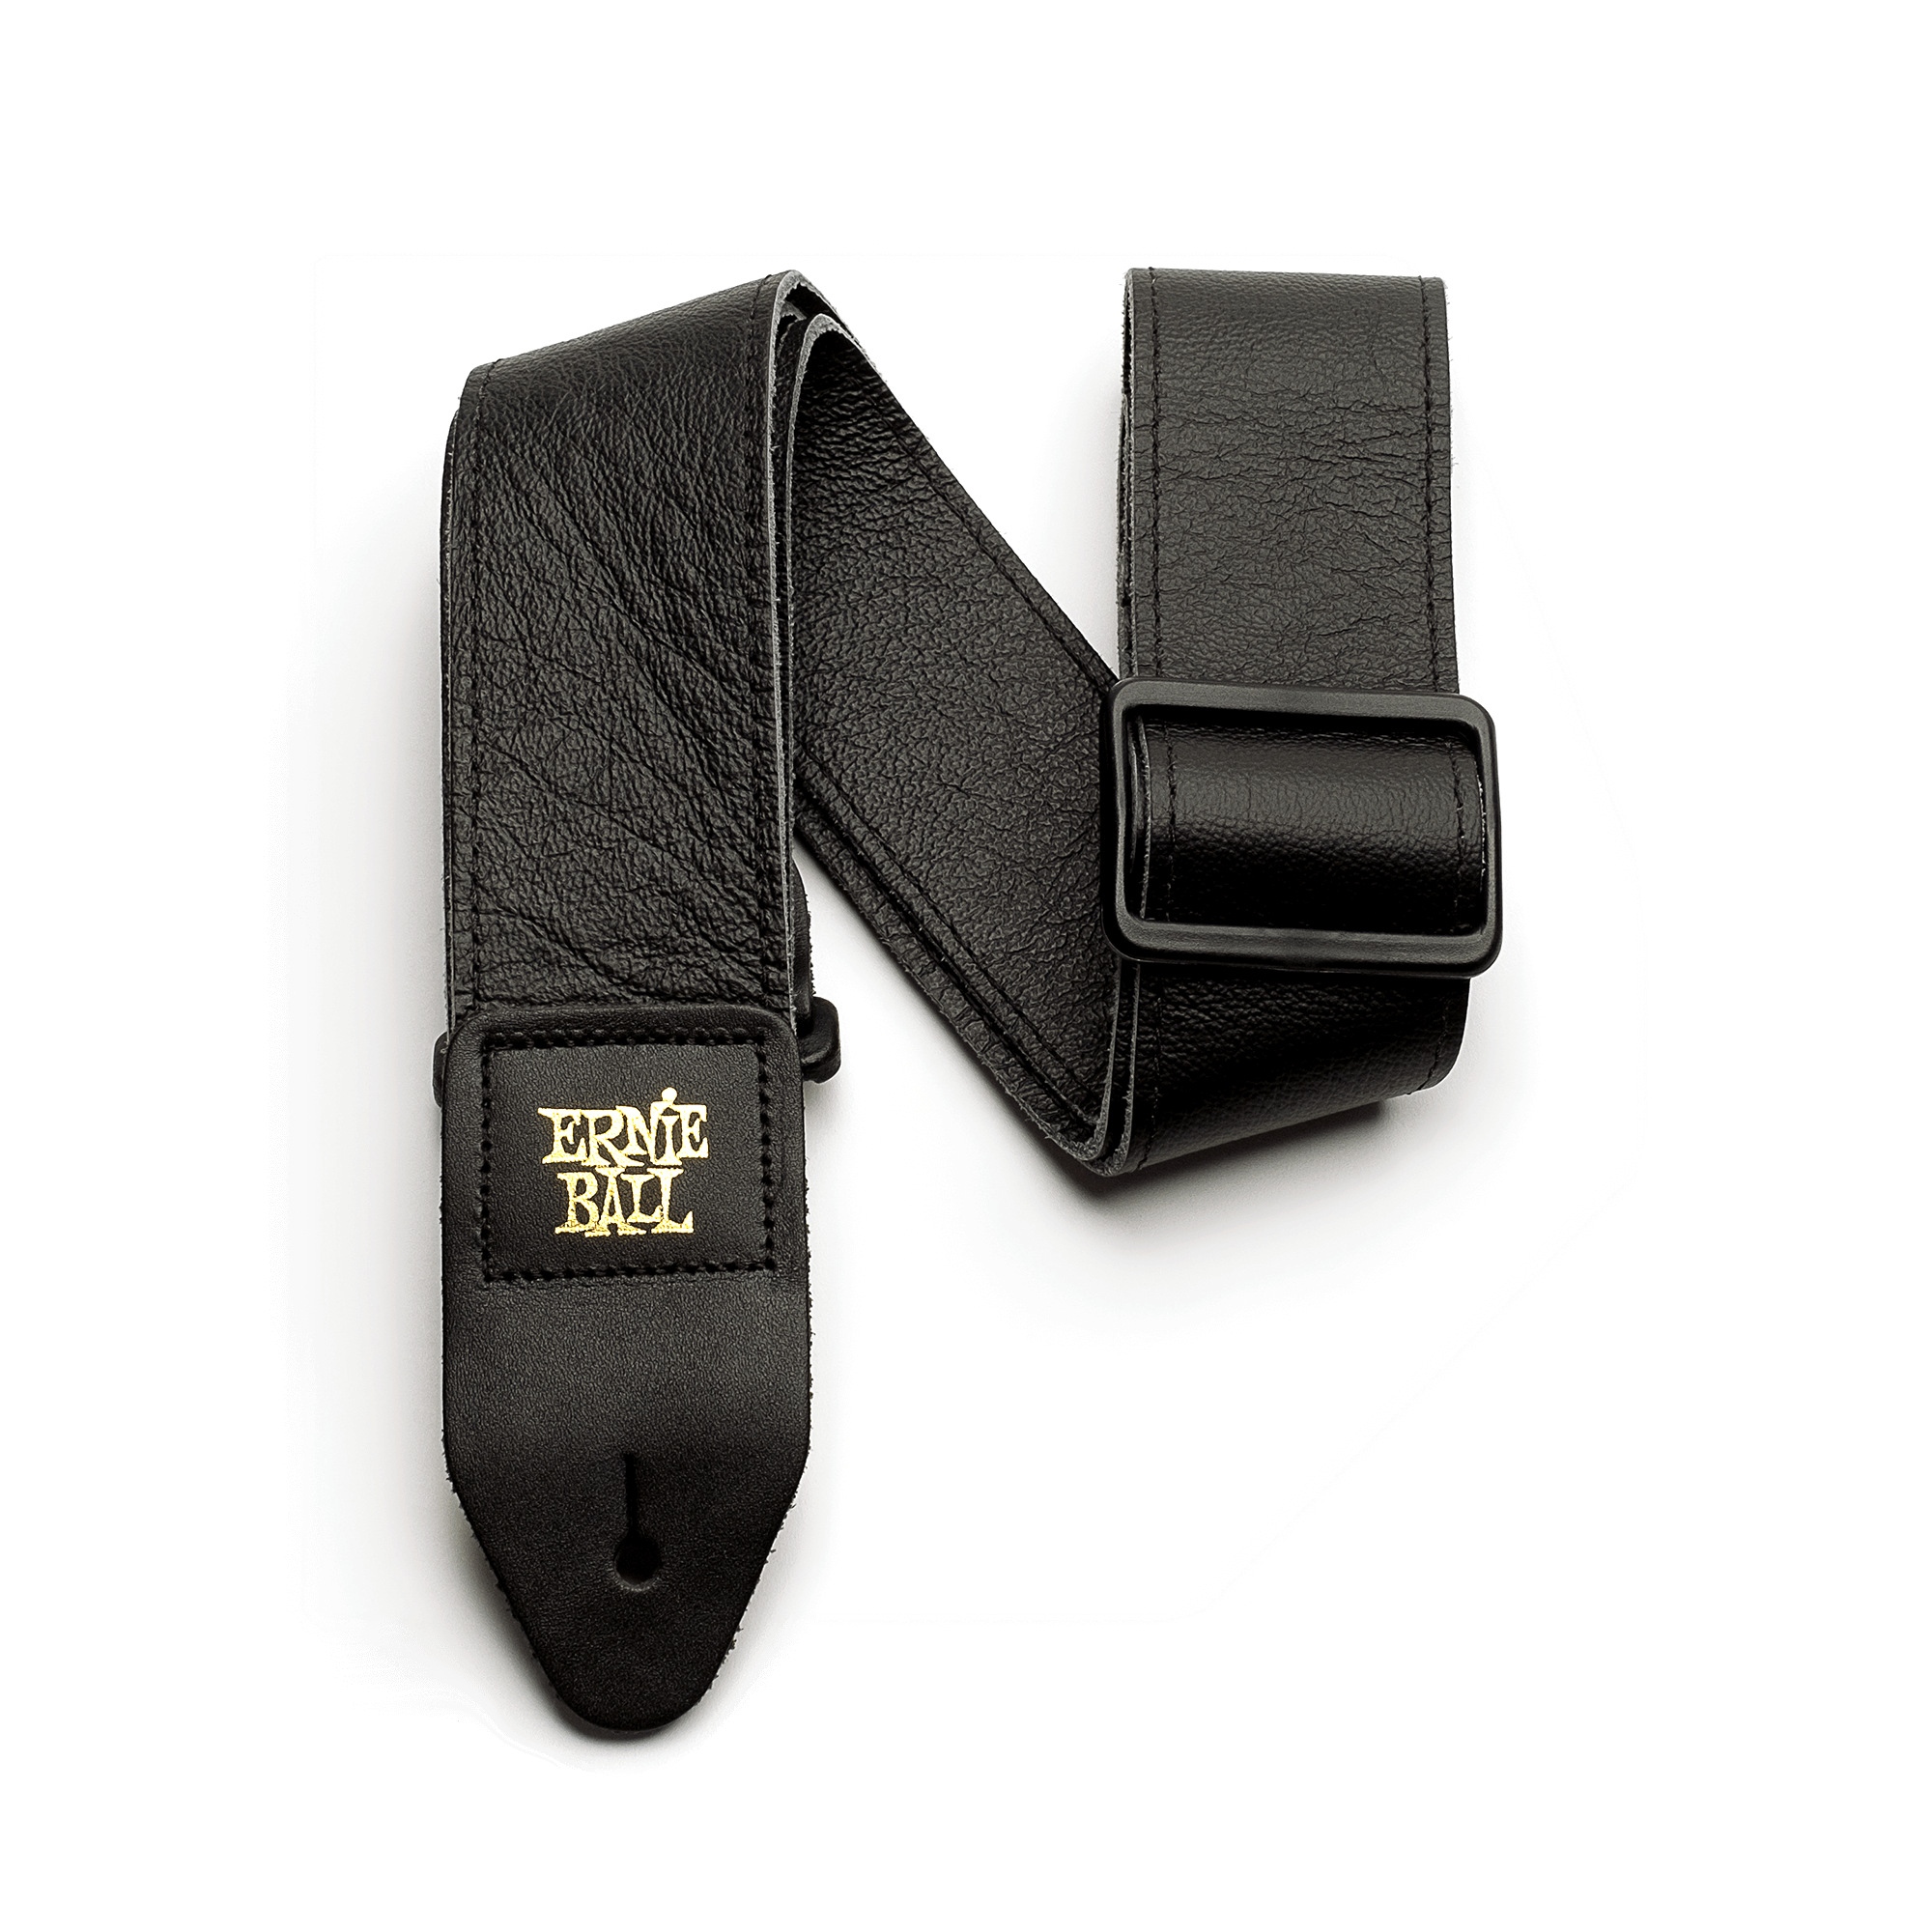 Ernie Ball P04134 Tri-Glide Leather Strap Black